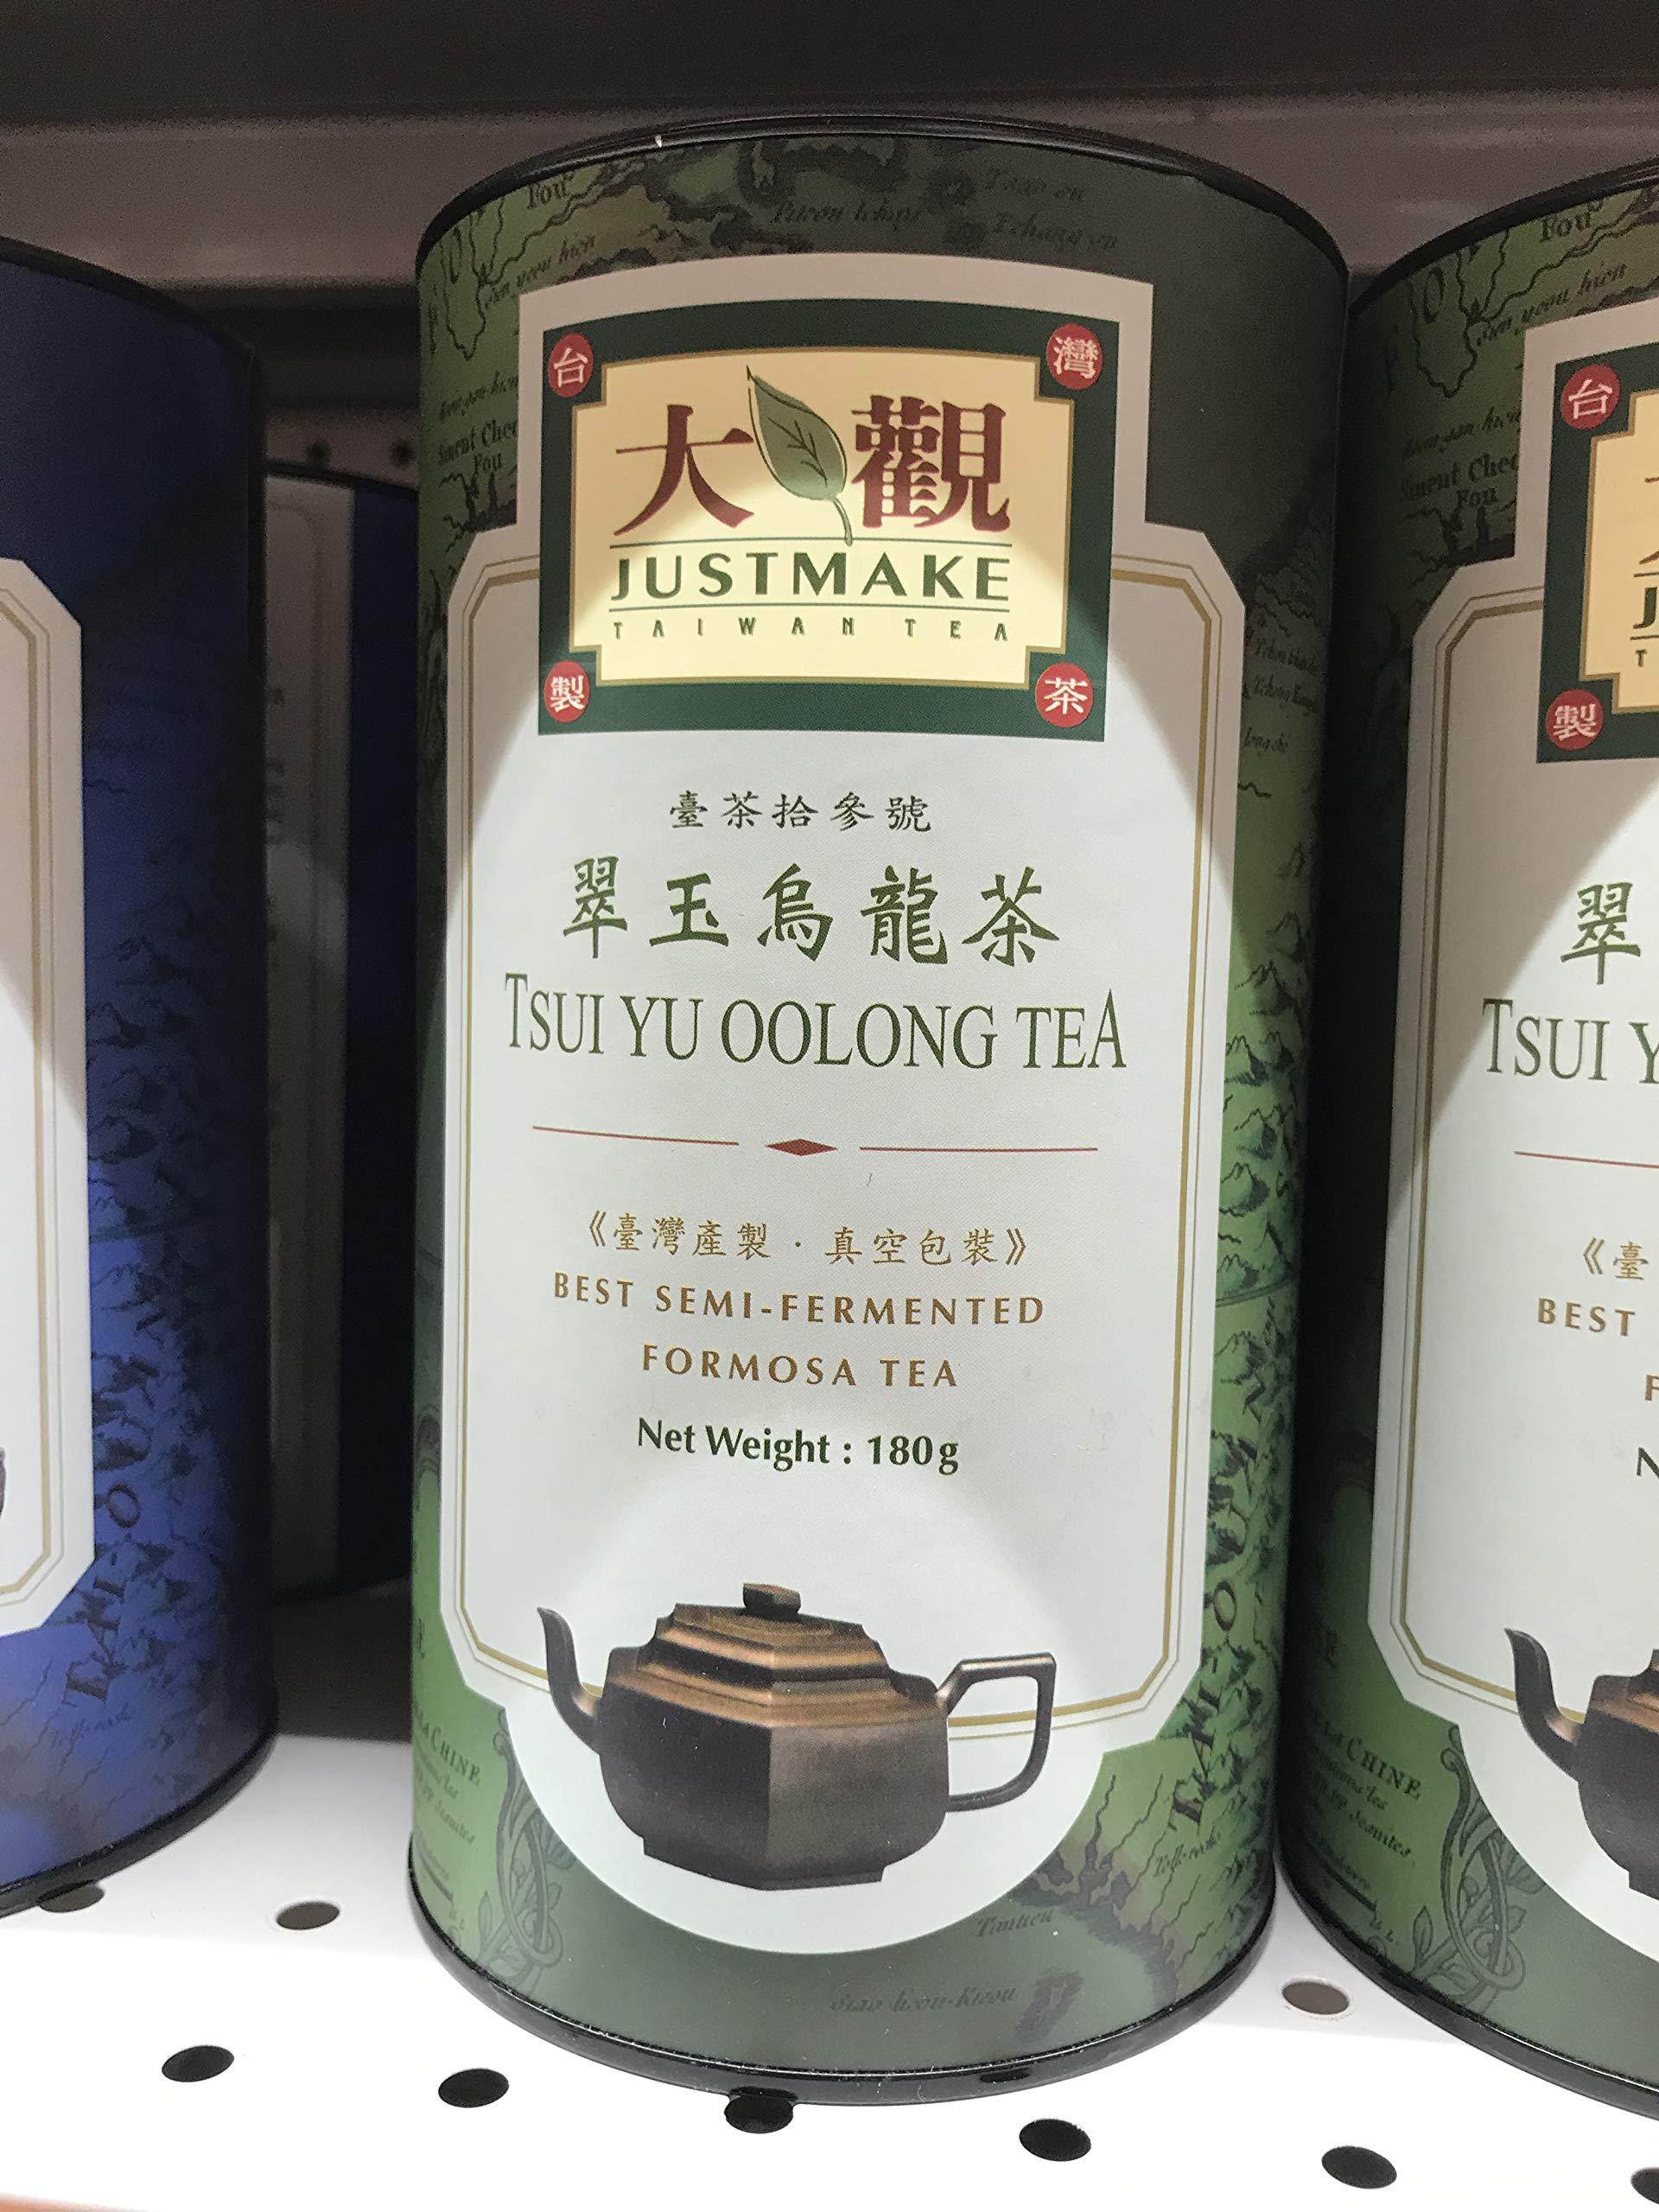 Justmake Taiwan Tea Tsui Yu Oolong Tea - 180g